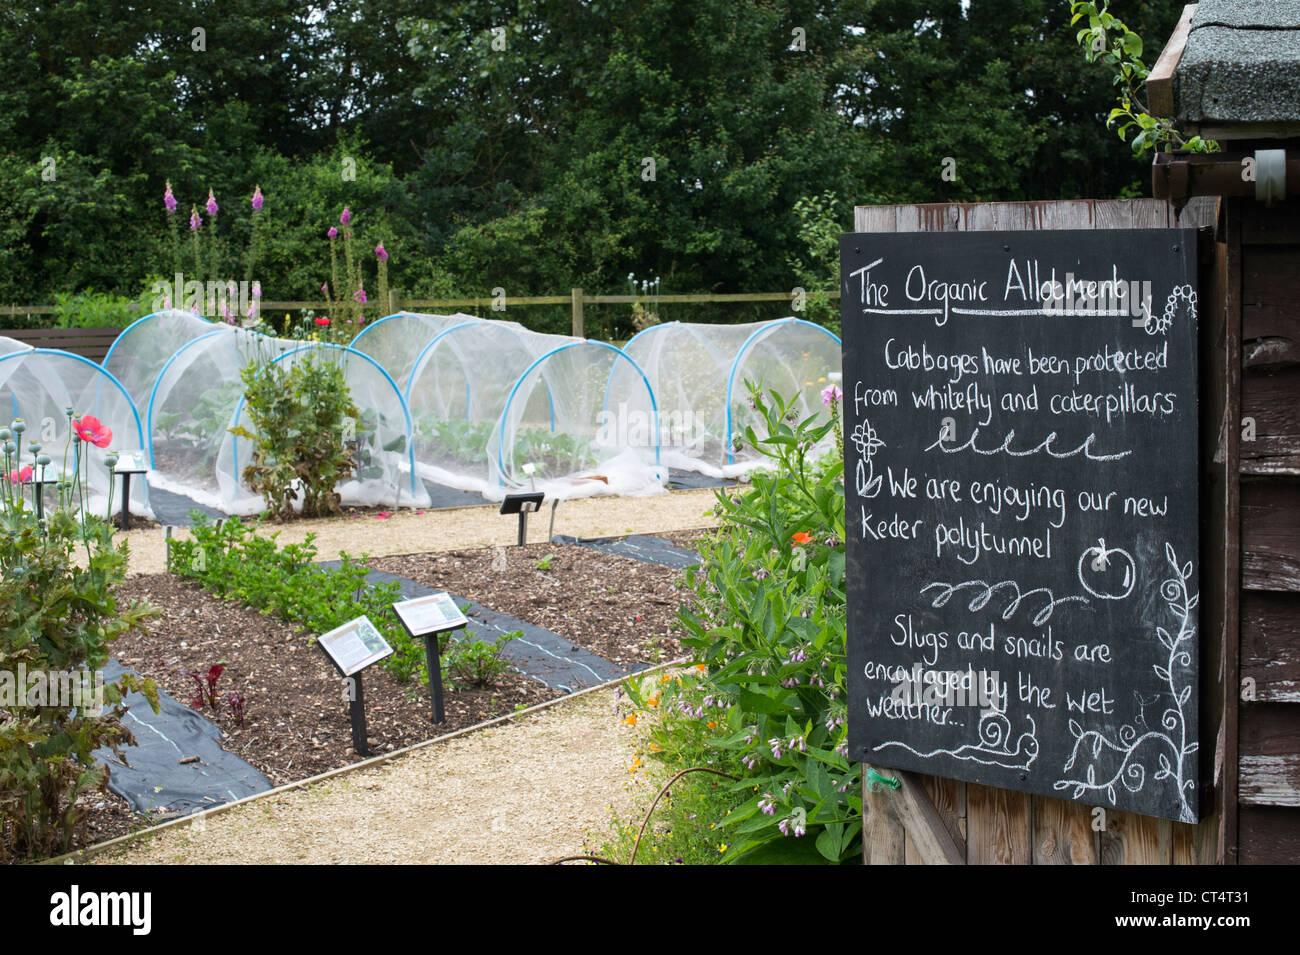 Vegetable allotment at Ryton Organic gardens , Warwickshire, England - Stock Image